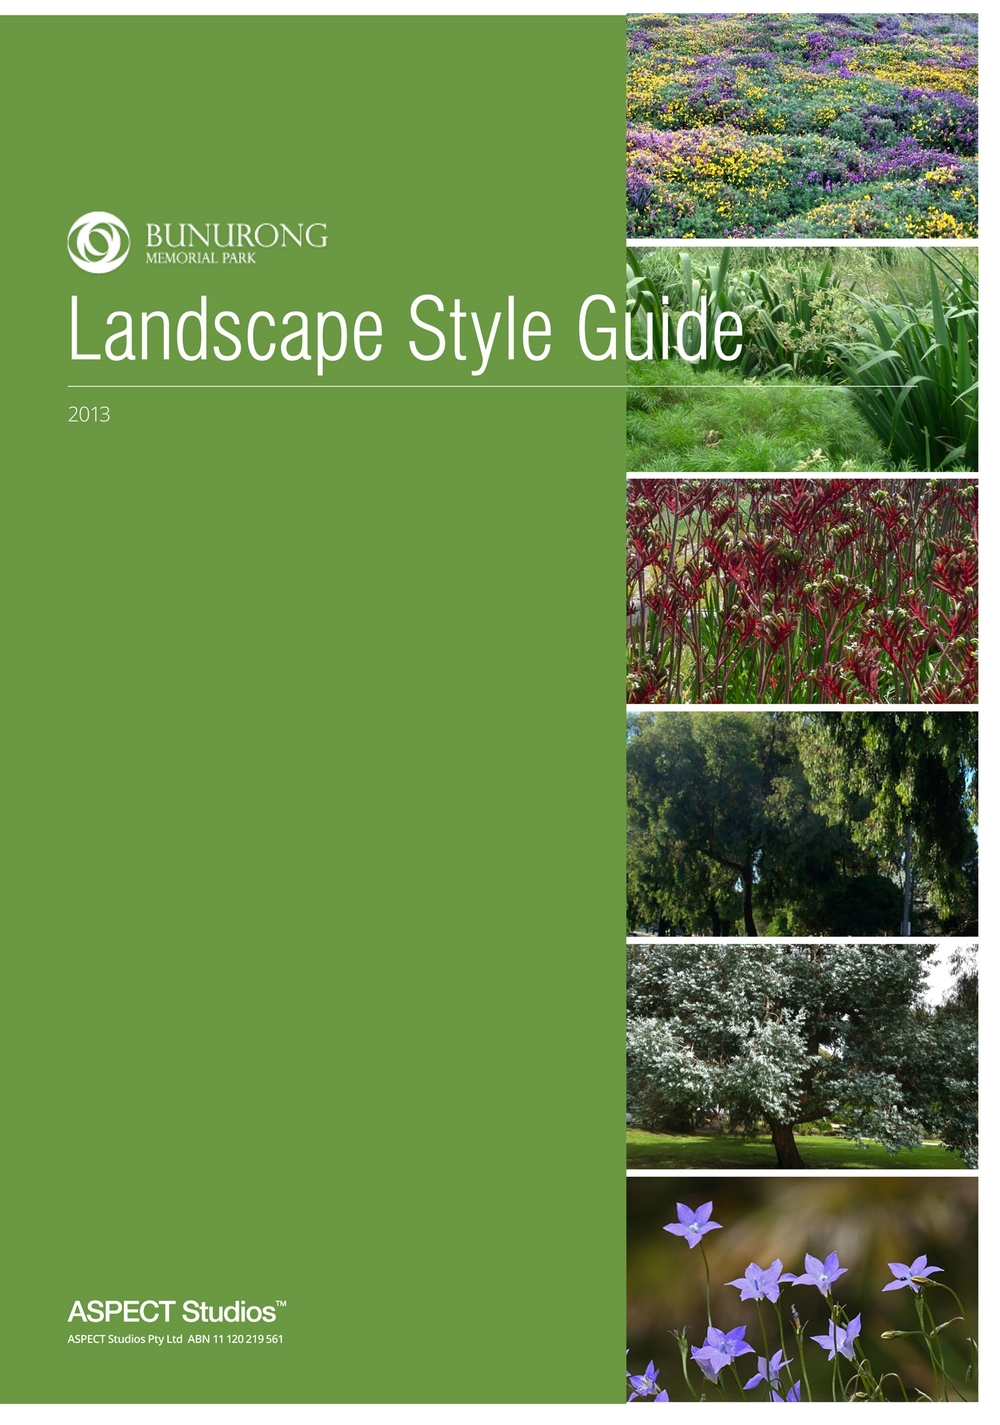 20131122_Landscape Style Guide DRAFT-1.jpg